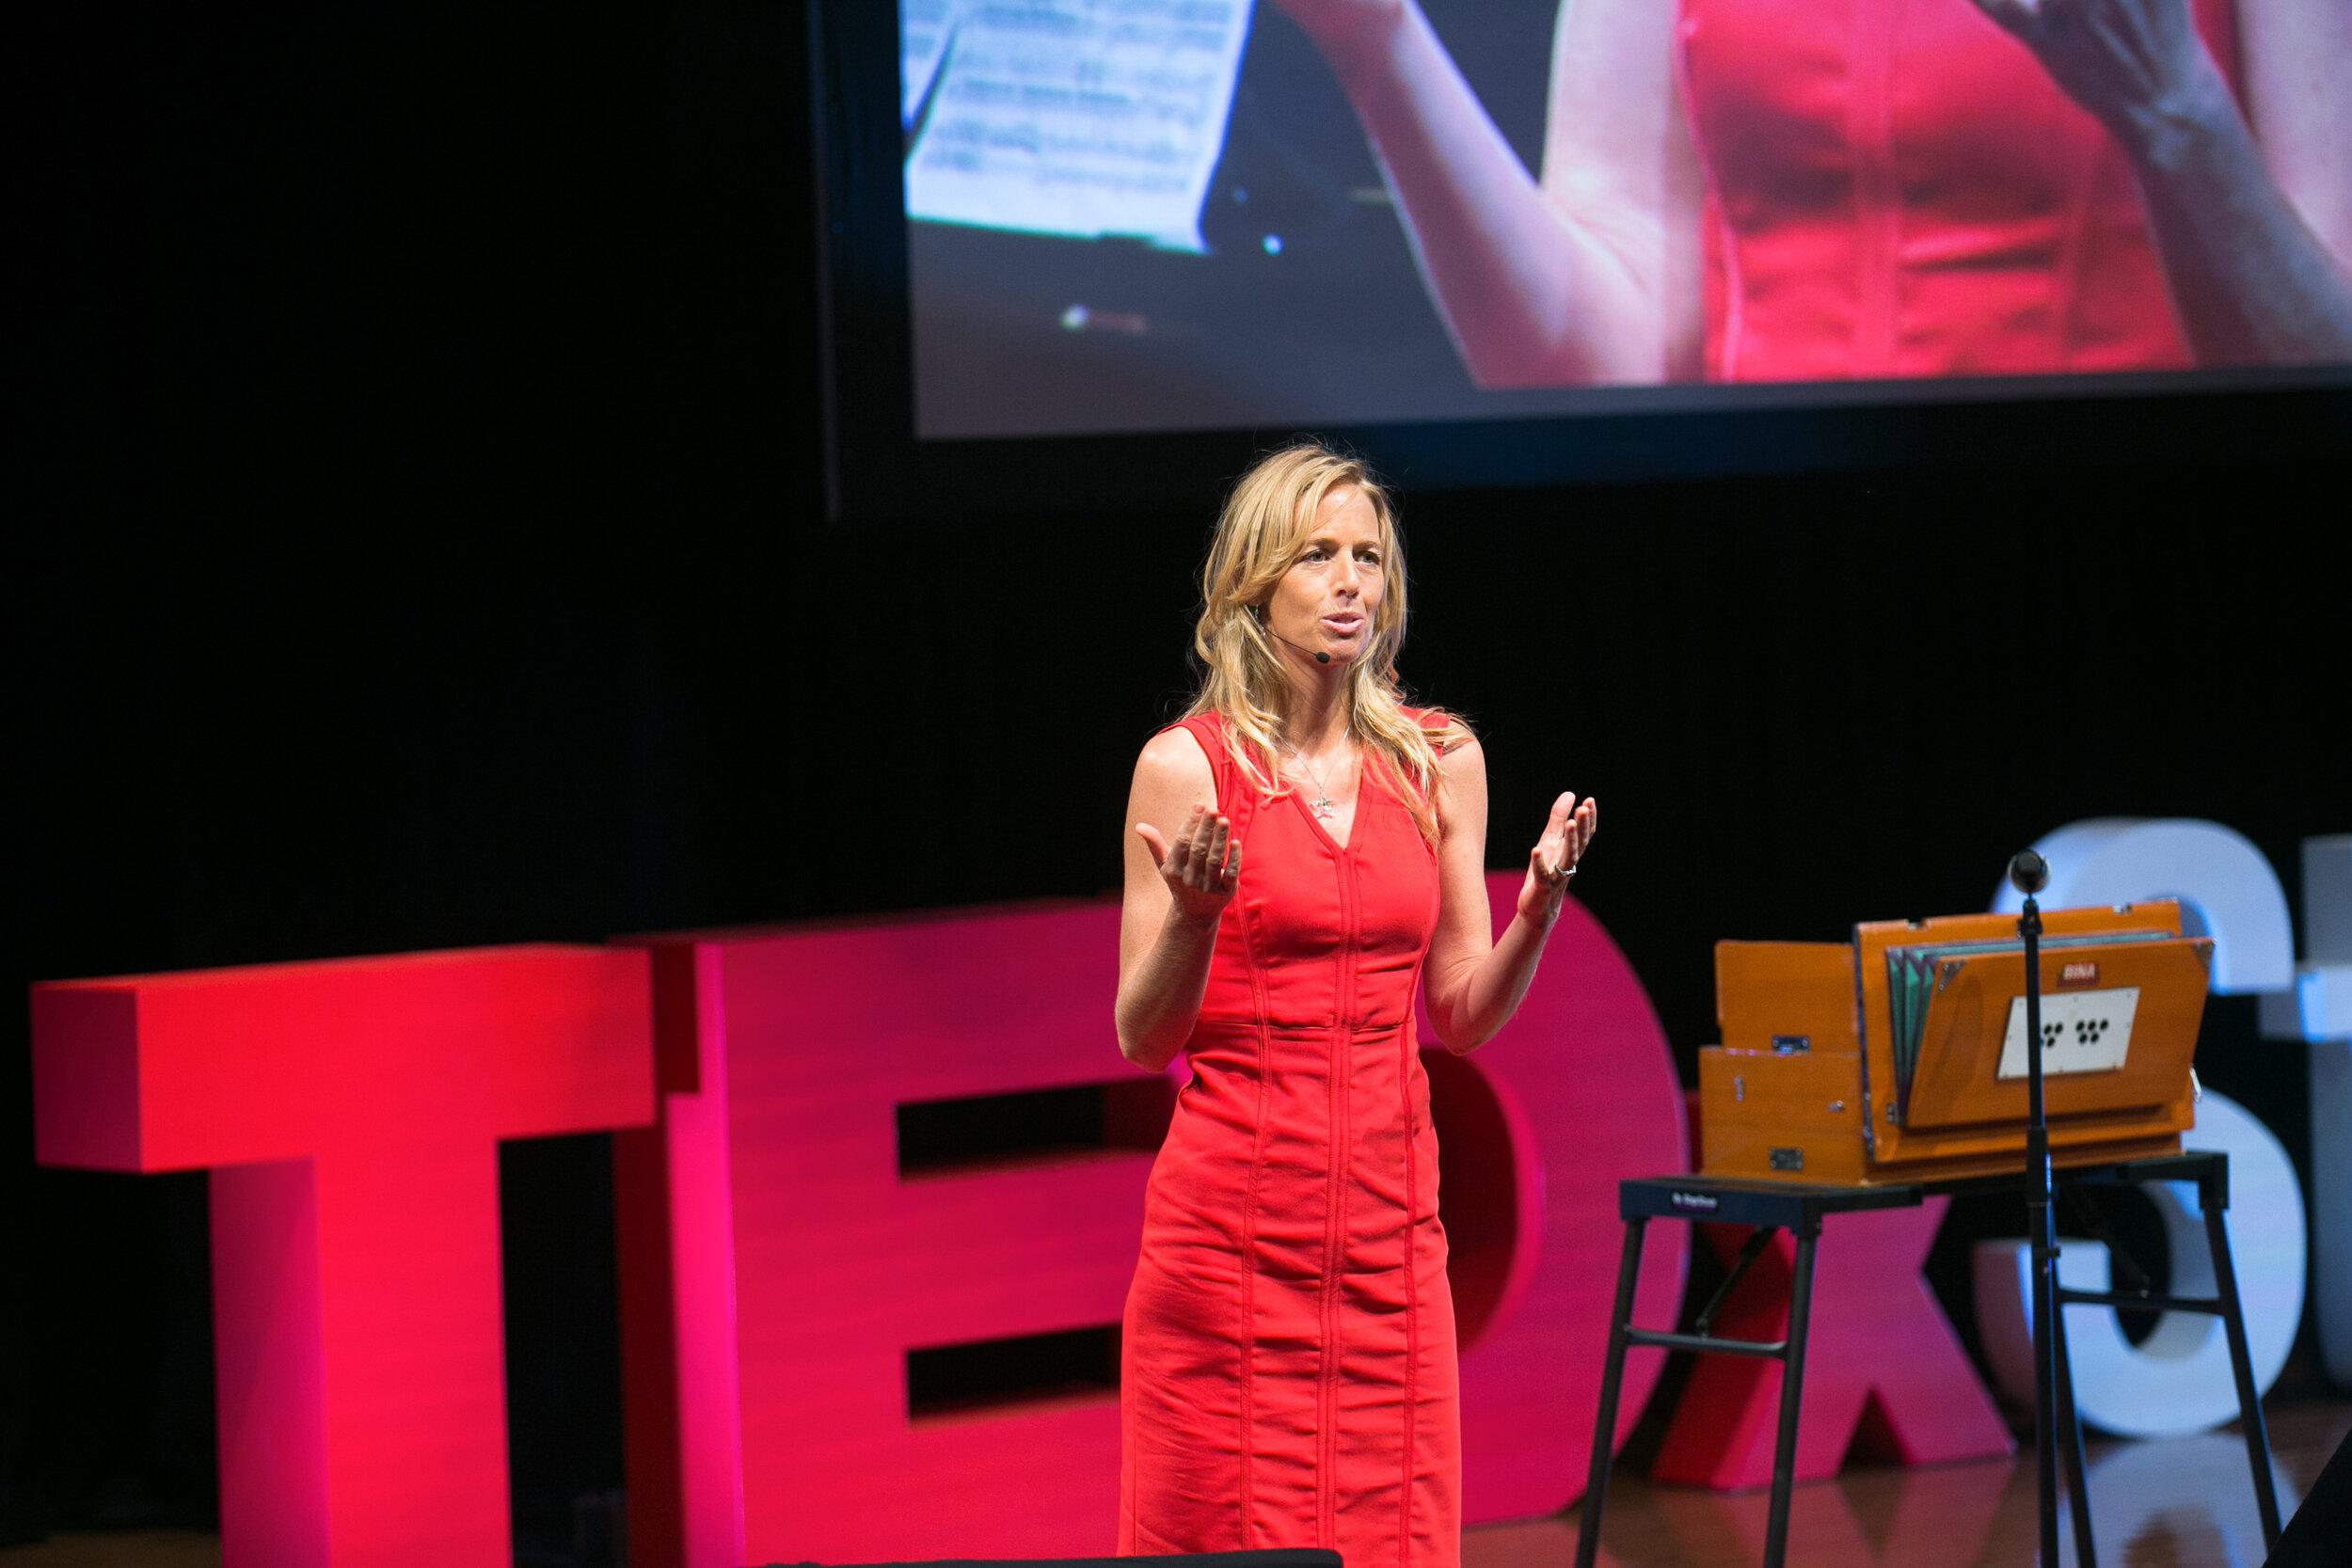 Tabby Biddle_TEDx Talk.jpg